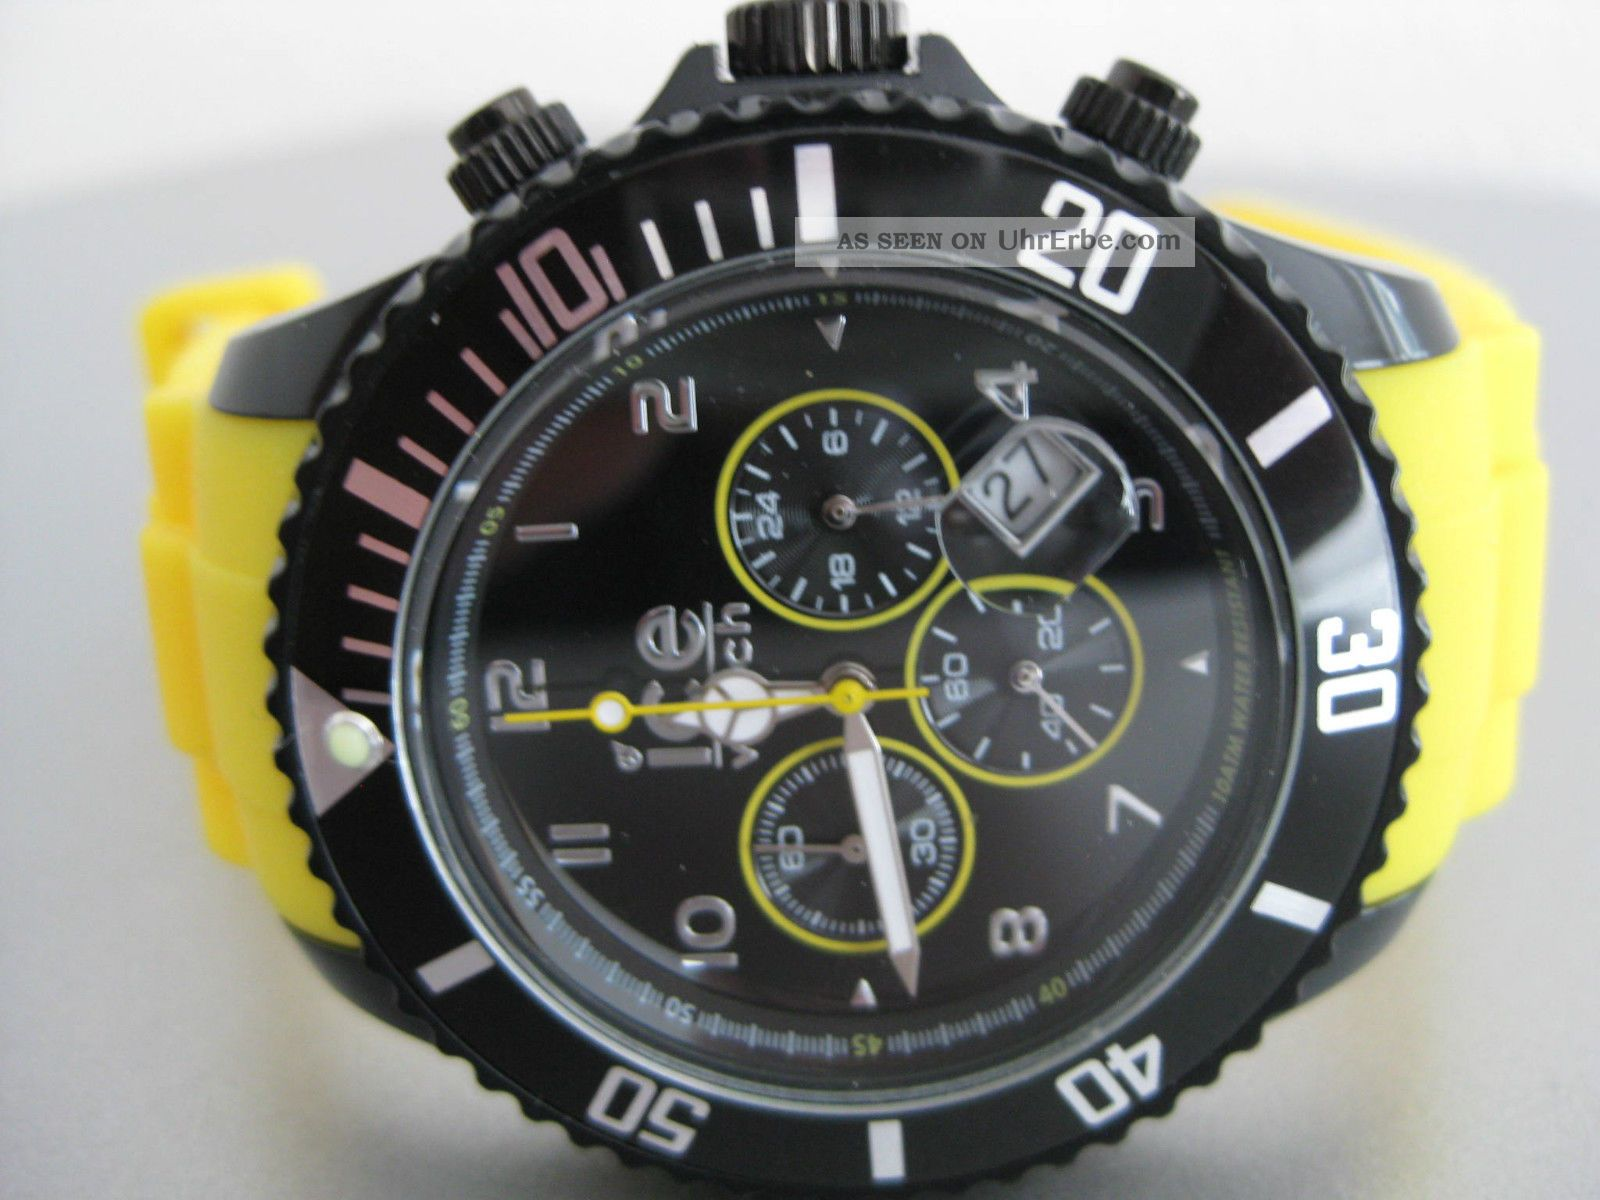 Ice Watch Ice - Chrono Armbanduhr Für Herren (ch.  By.  B.  S.  10) Armbanduhren Bild